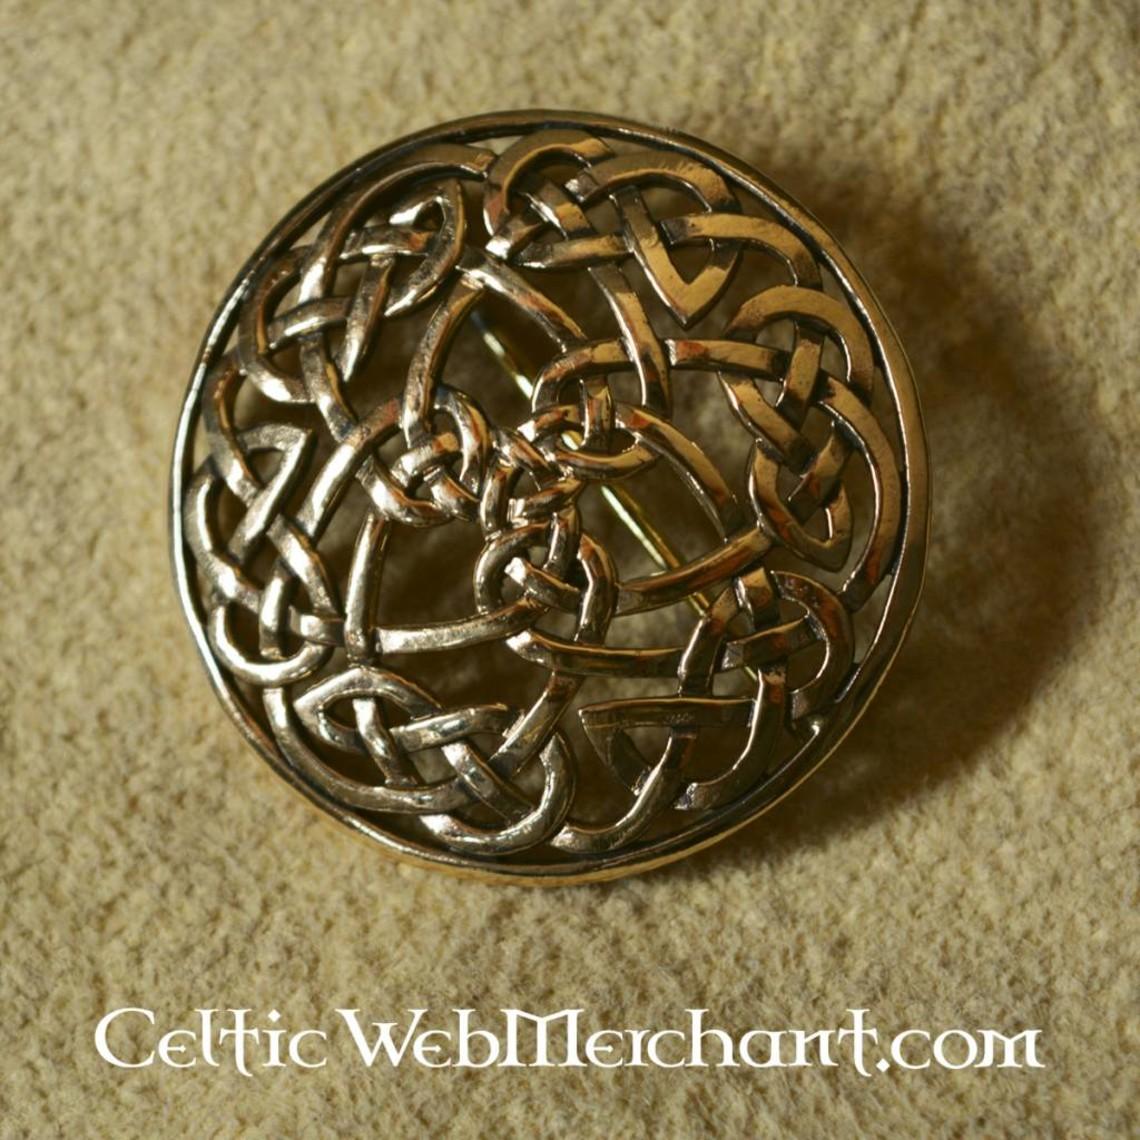 Redondea broche celta